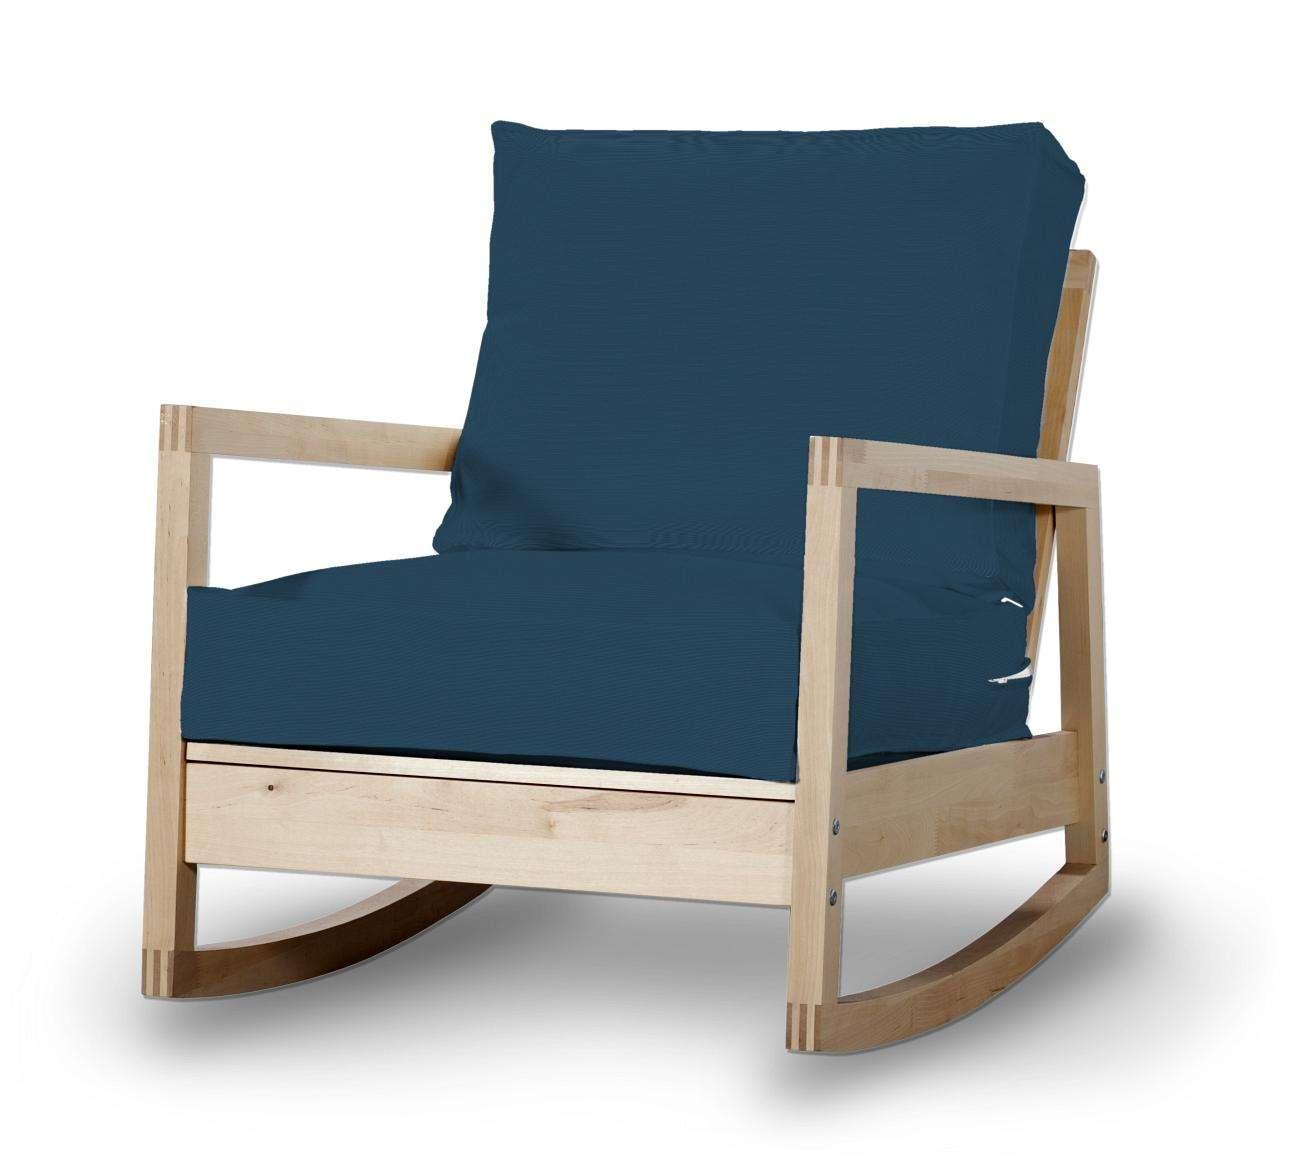 Pokrowiec na fotel Lillberg Fotel Lillberg w kolekcji Cotton Panama, tkanina: 702-30